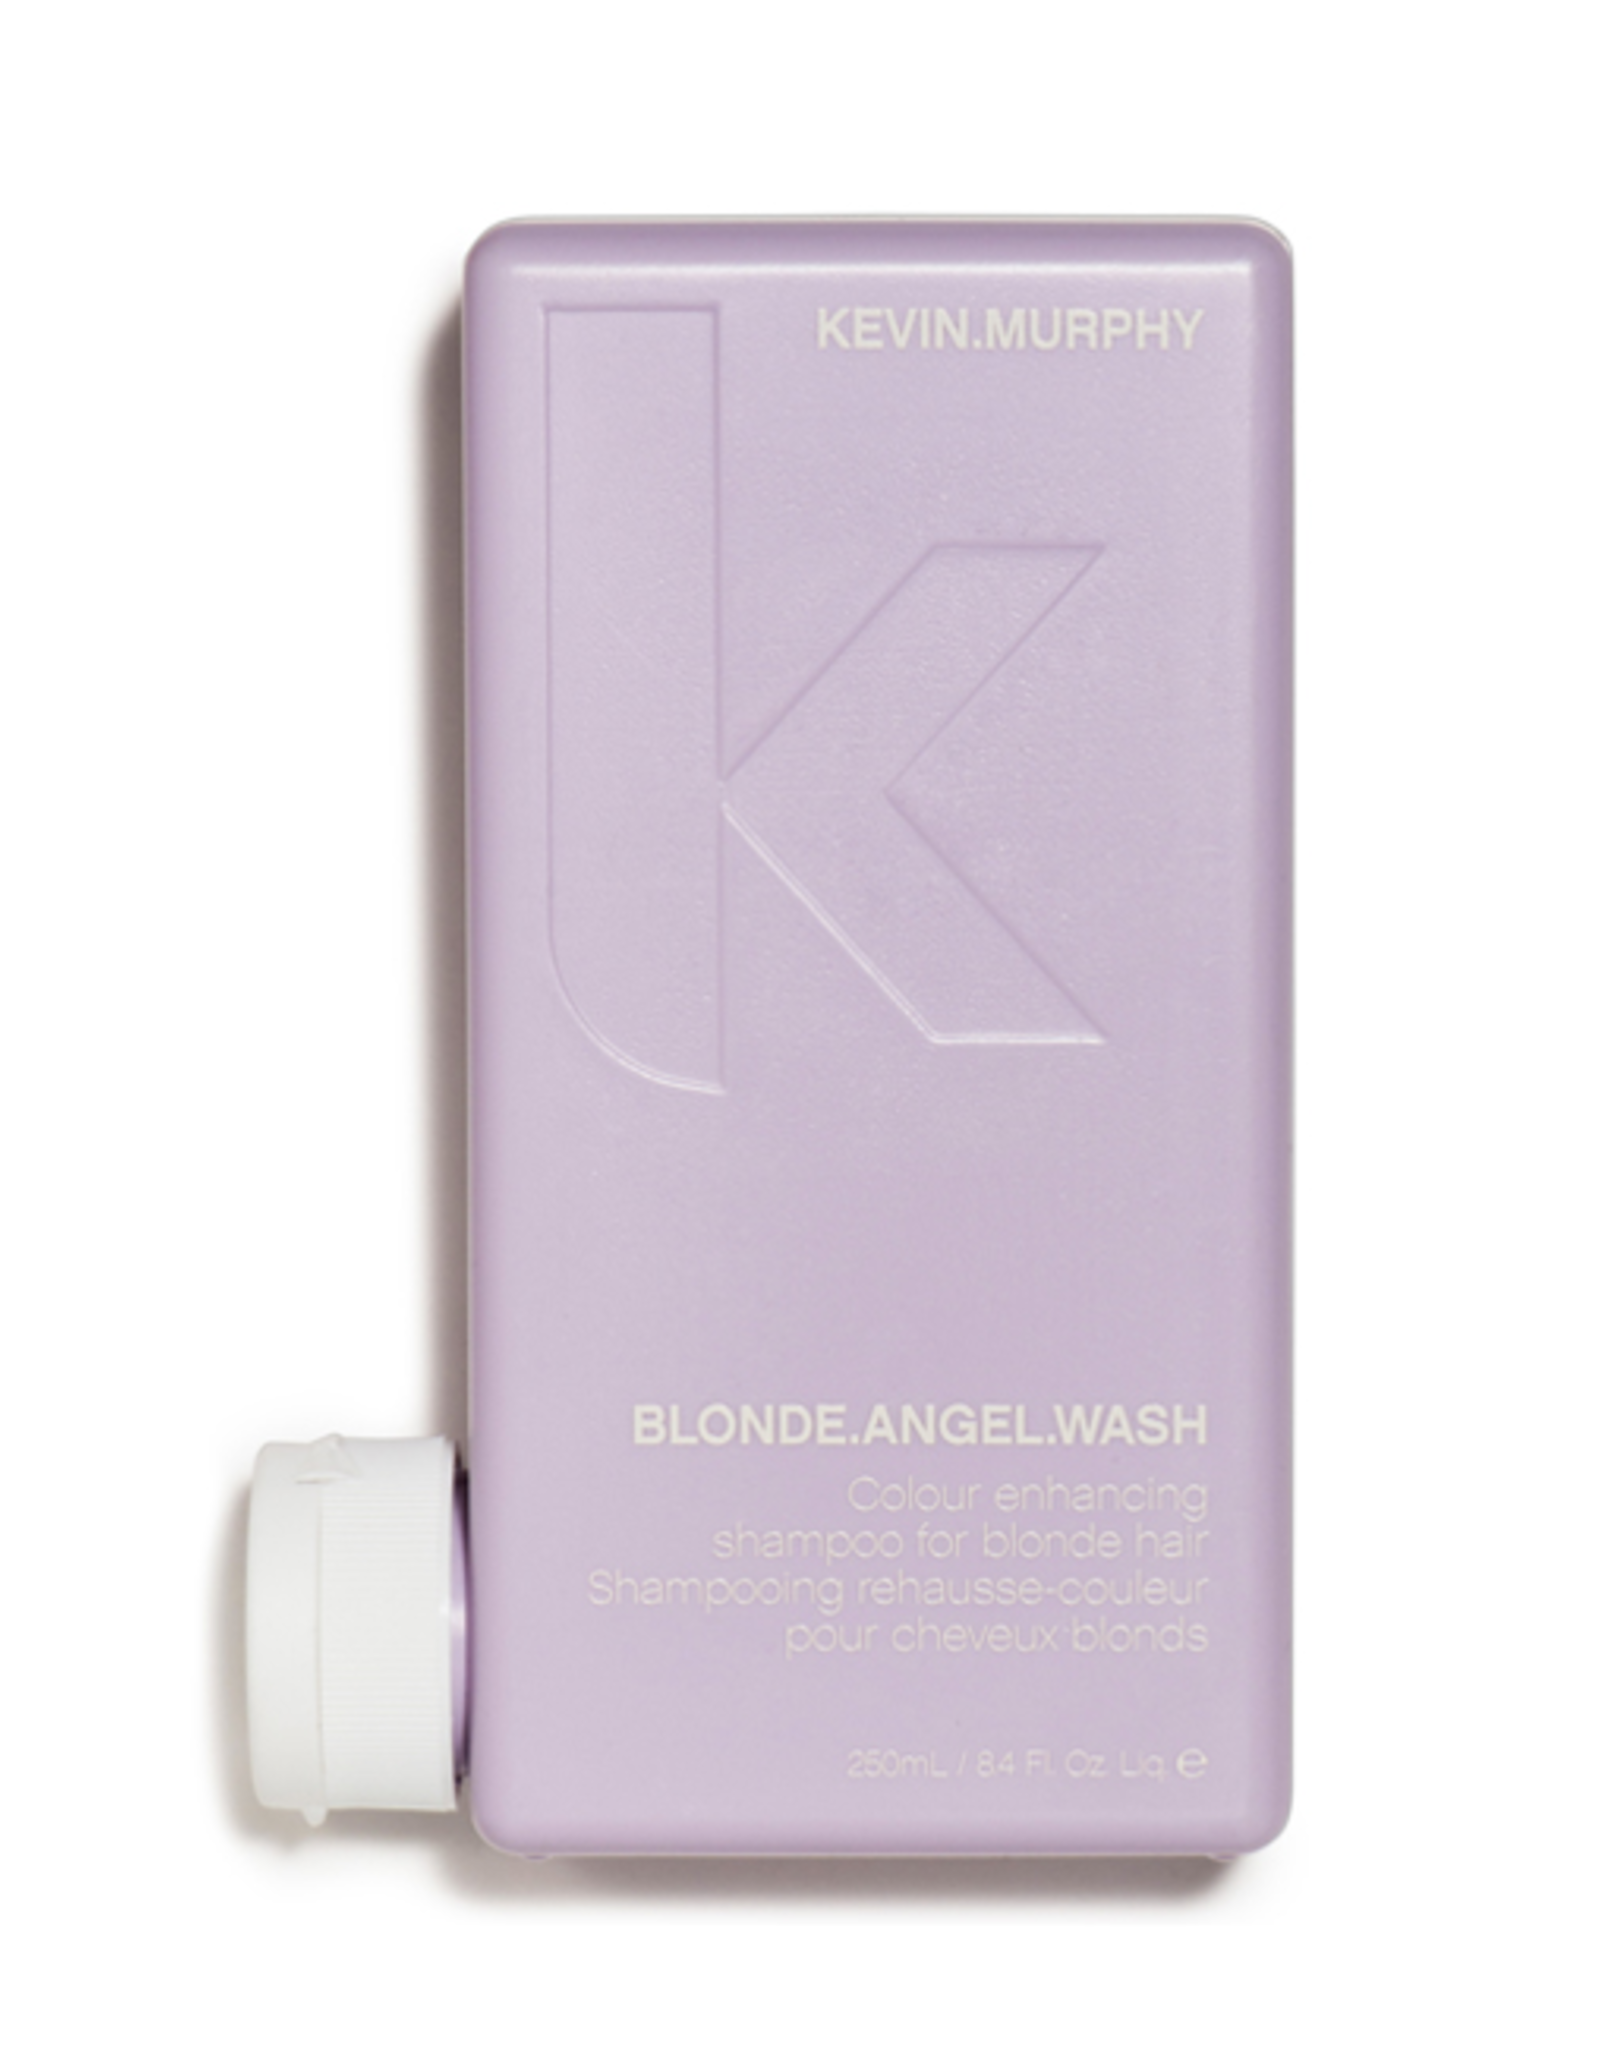 KEVIN.MURPHY Blonde.Angel.Wash (250 ml)